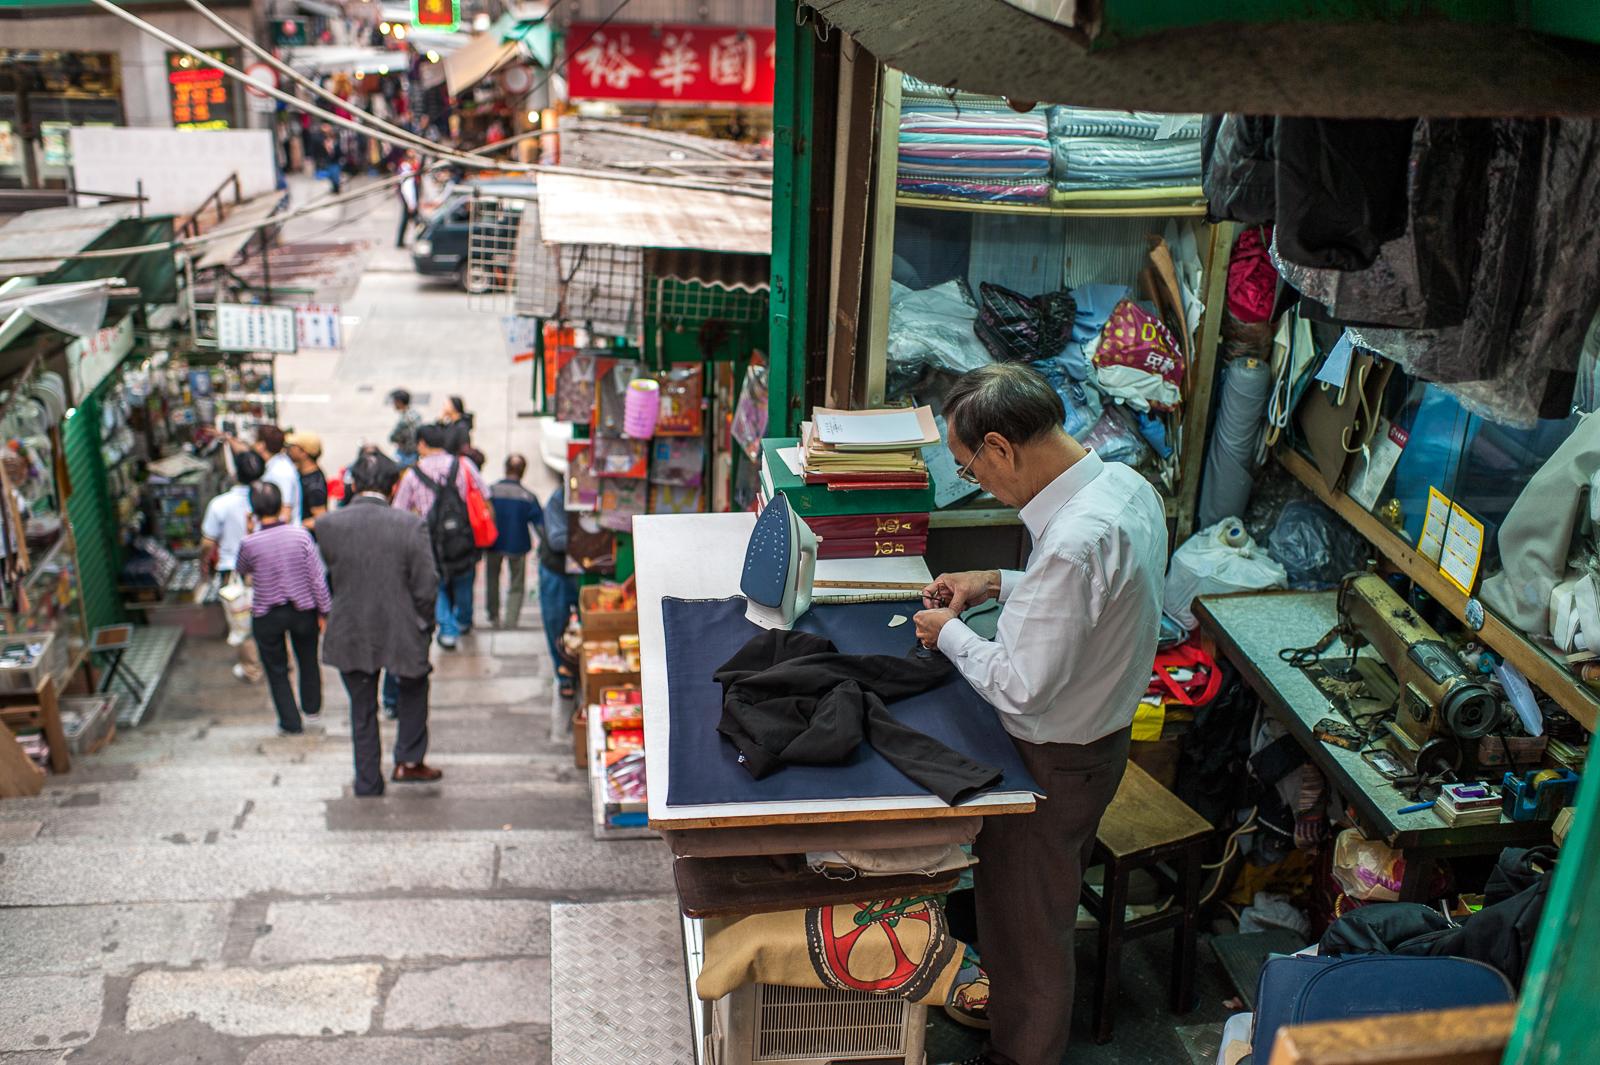 Street Tailor by kmetjurec